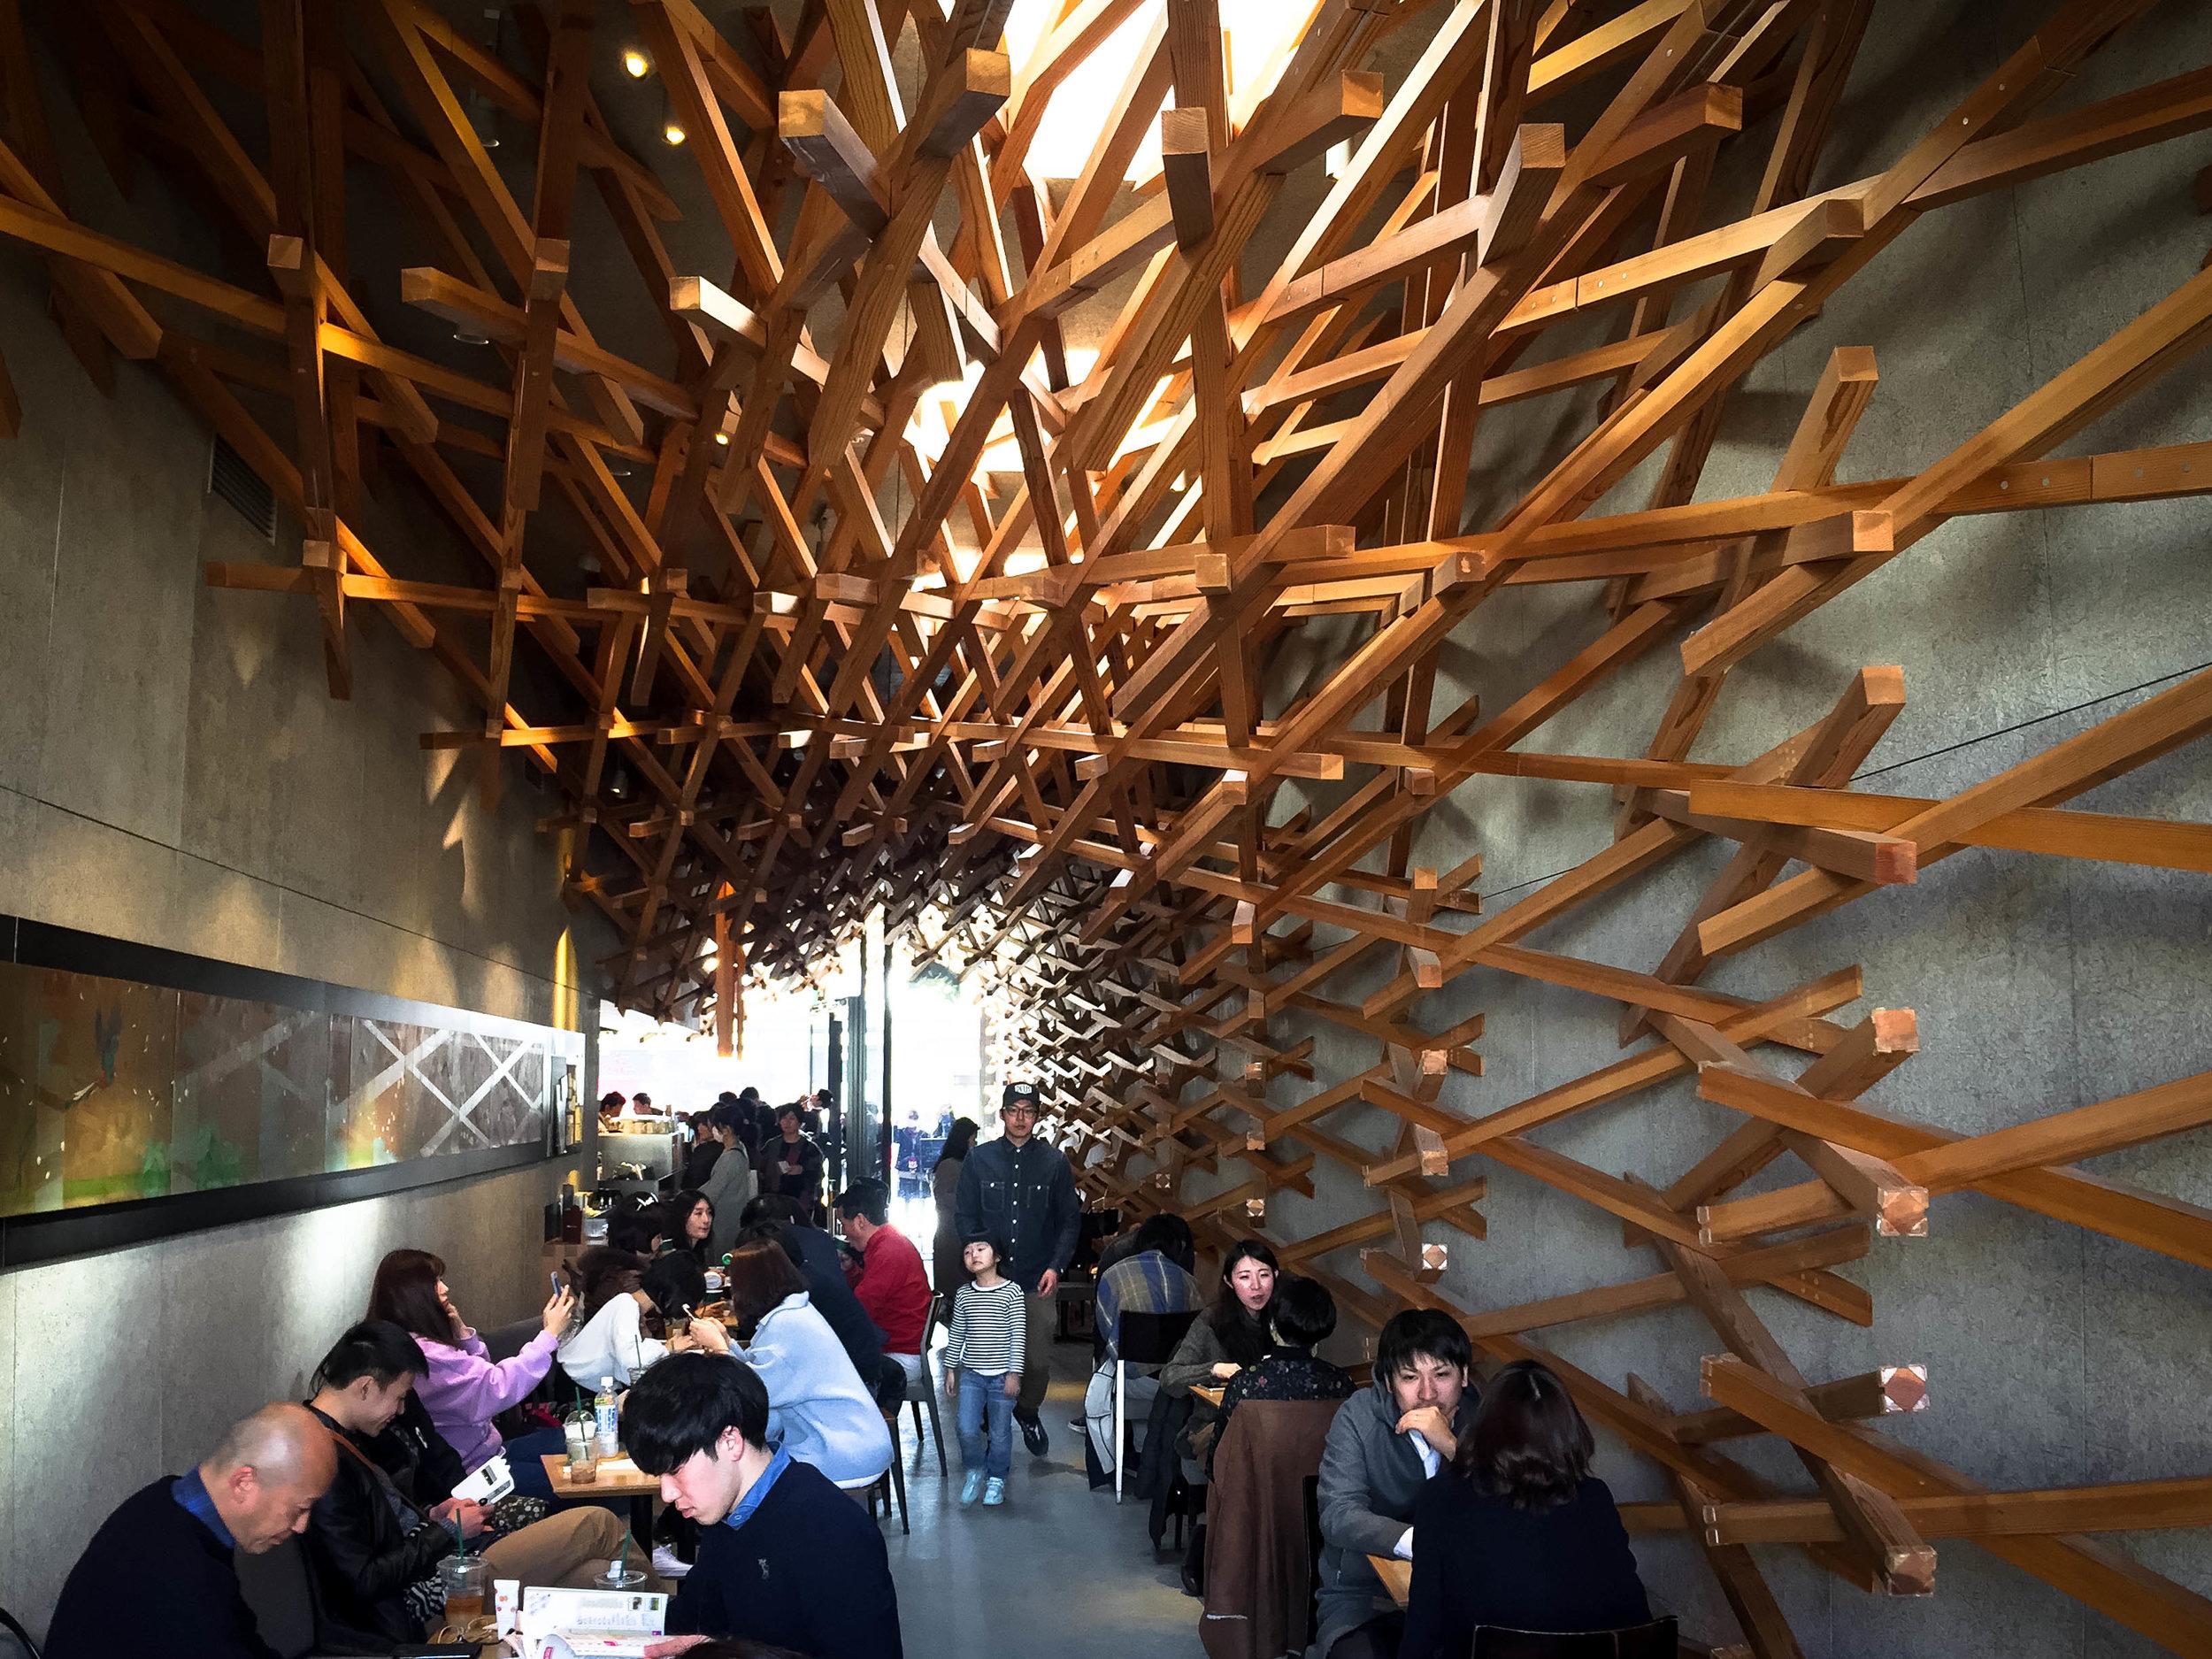 Interior of the Starbucks designed by Kengo Kuma.